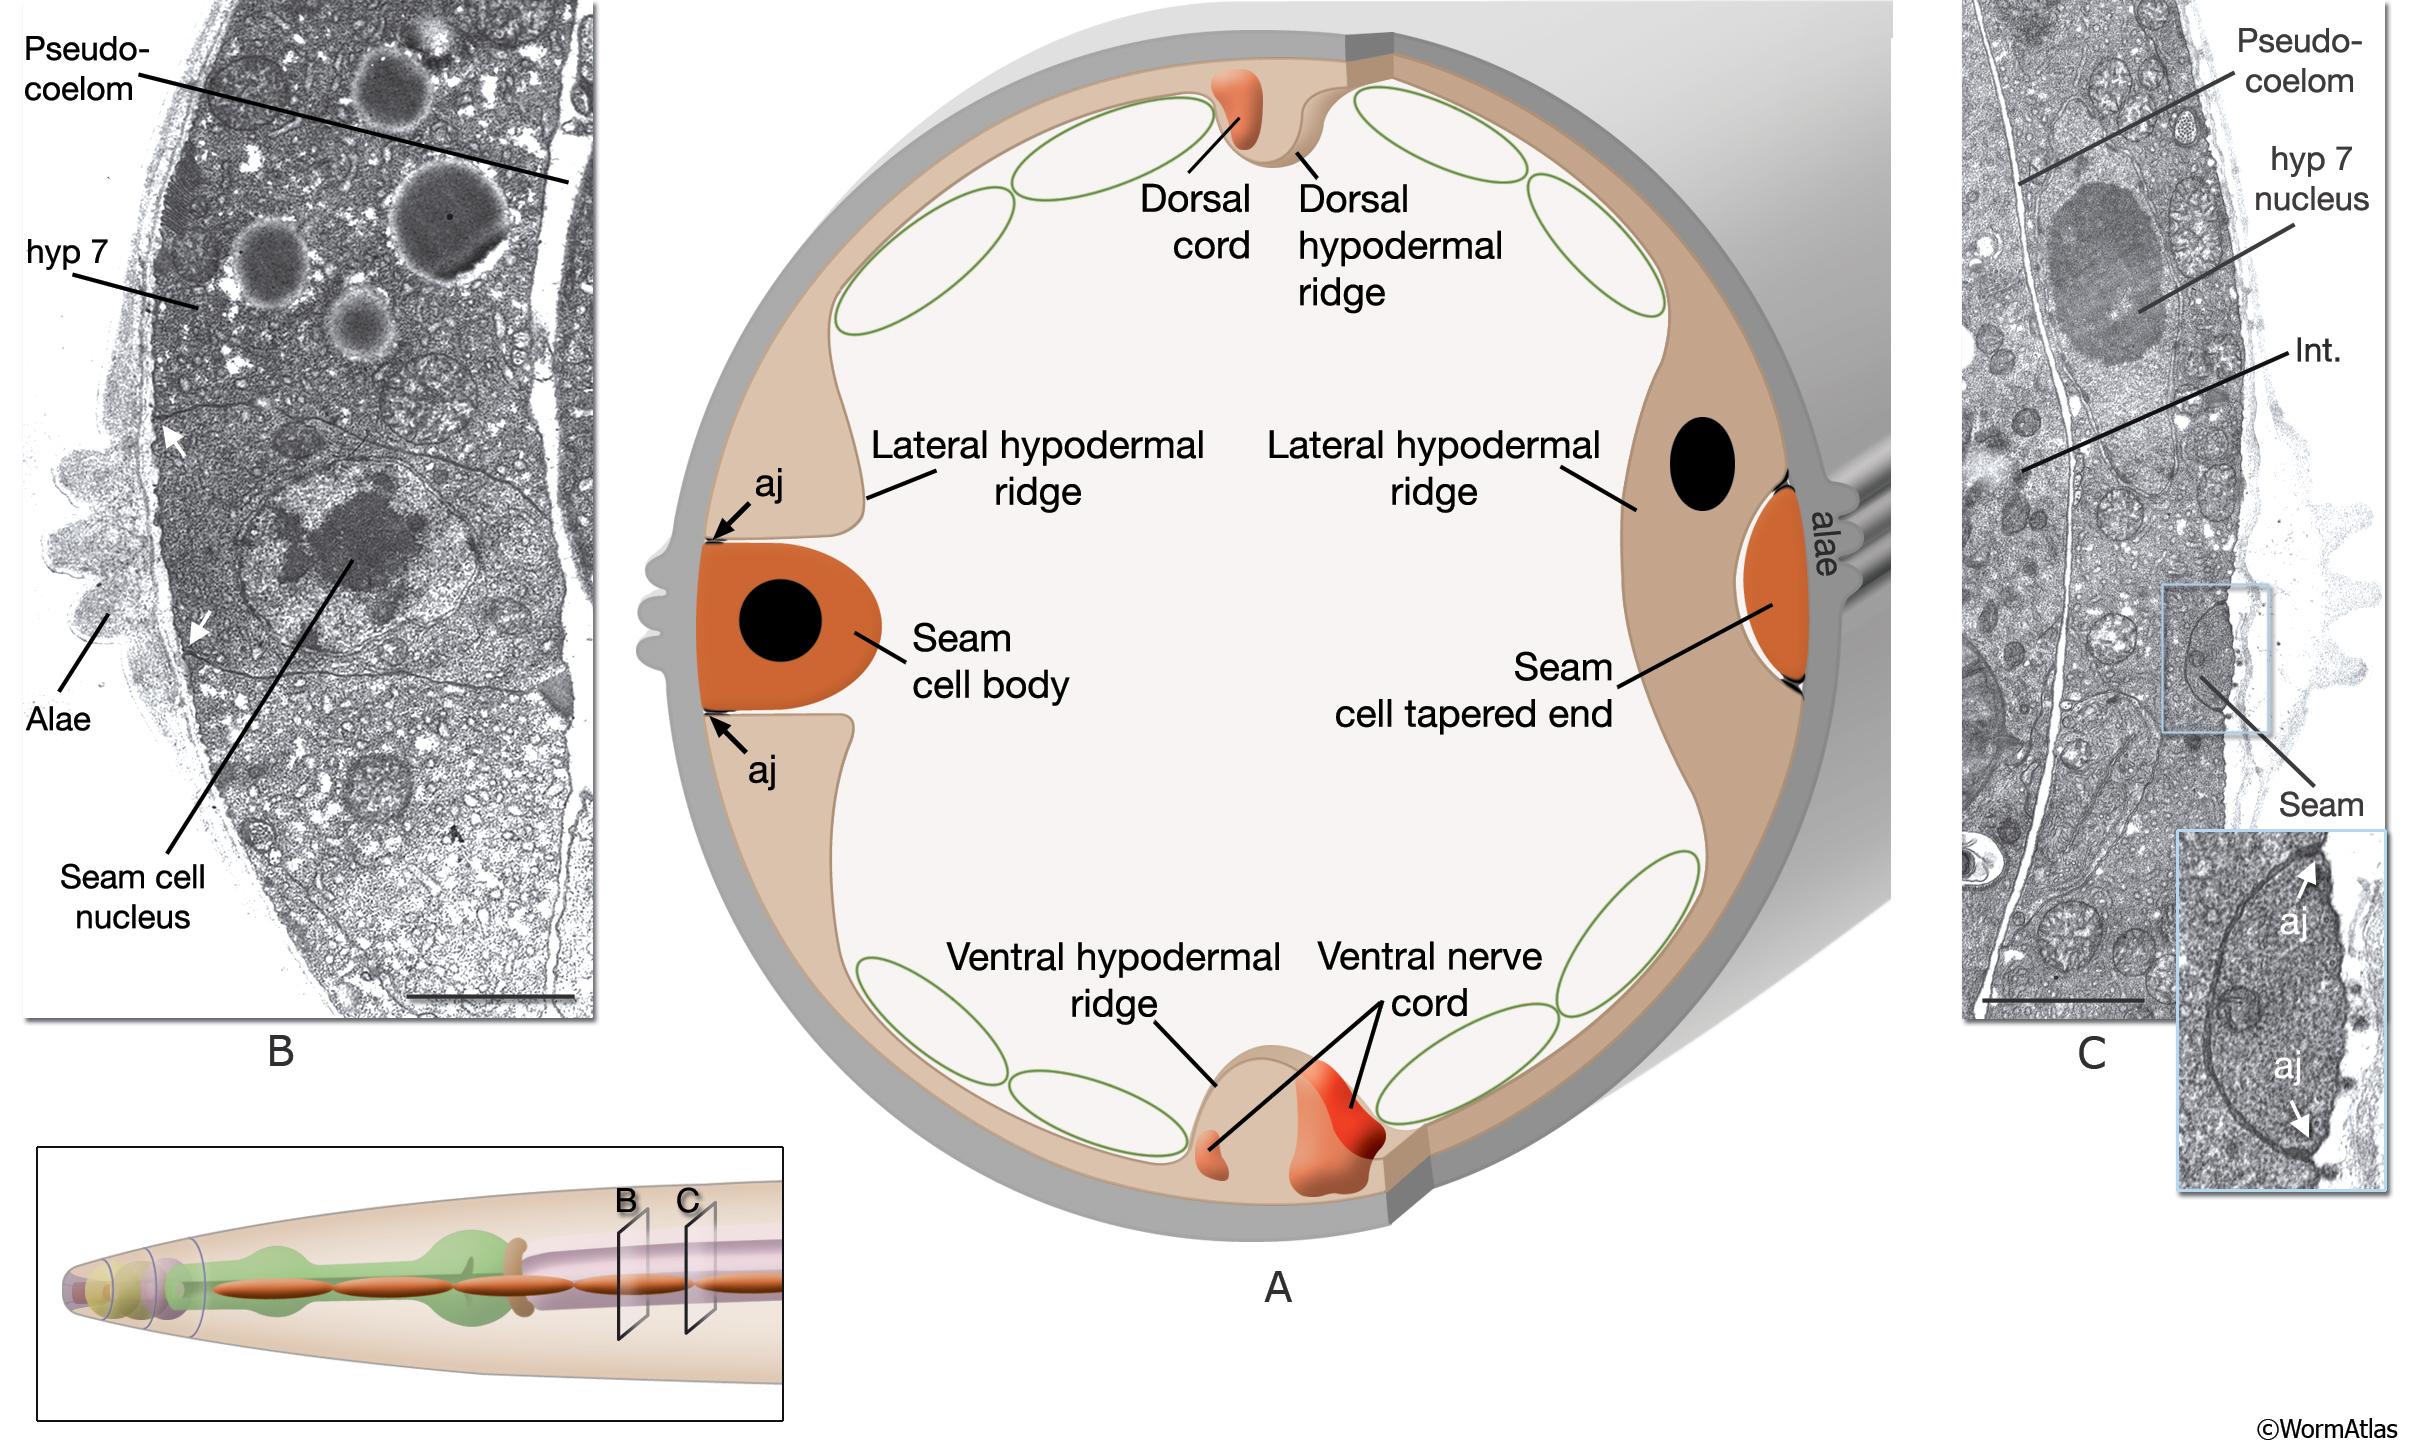 Hermaphrodite - Epithelial System - Seam Cells